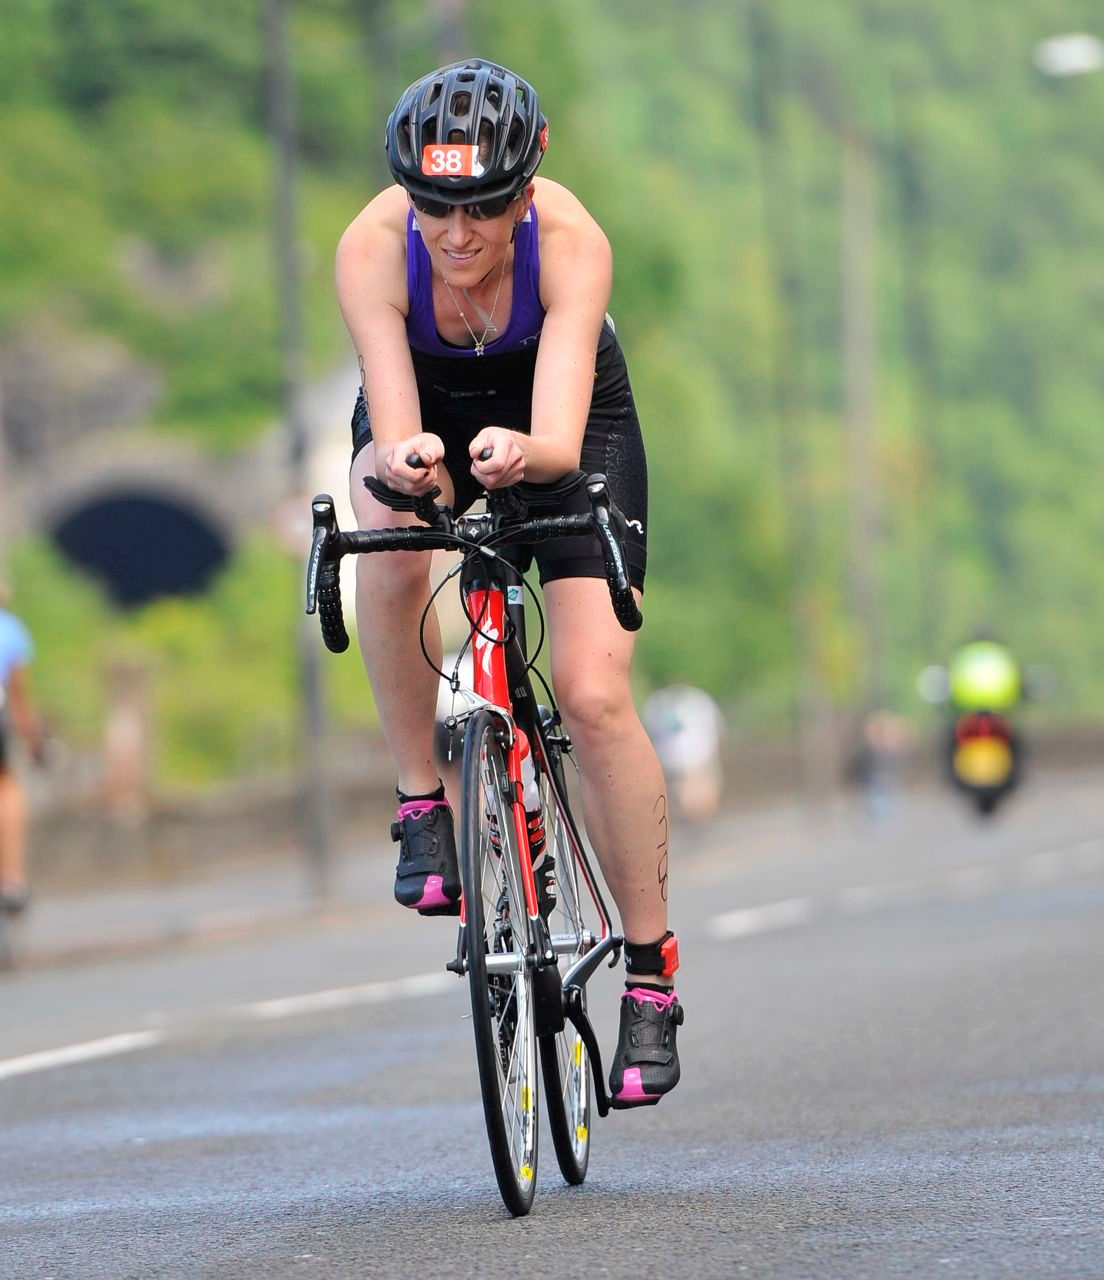 Katy Campbell on the bike at Bristol Harbourside Triathlon